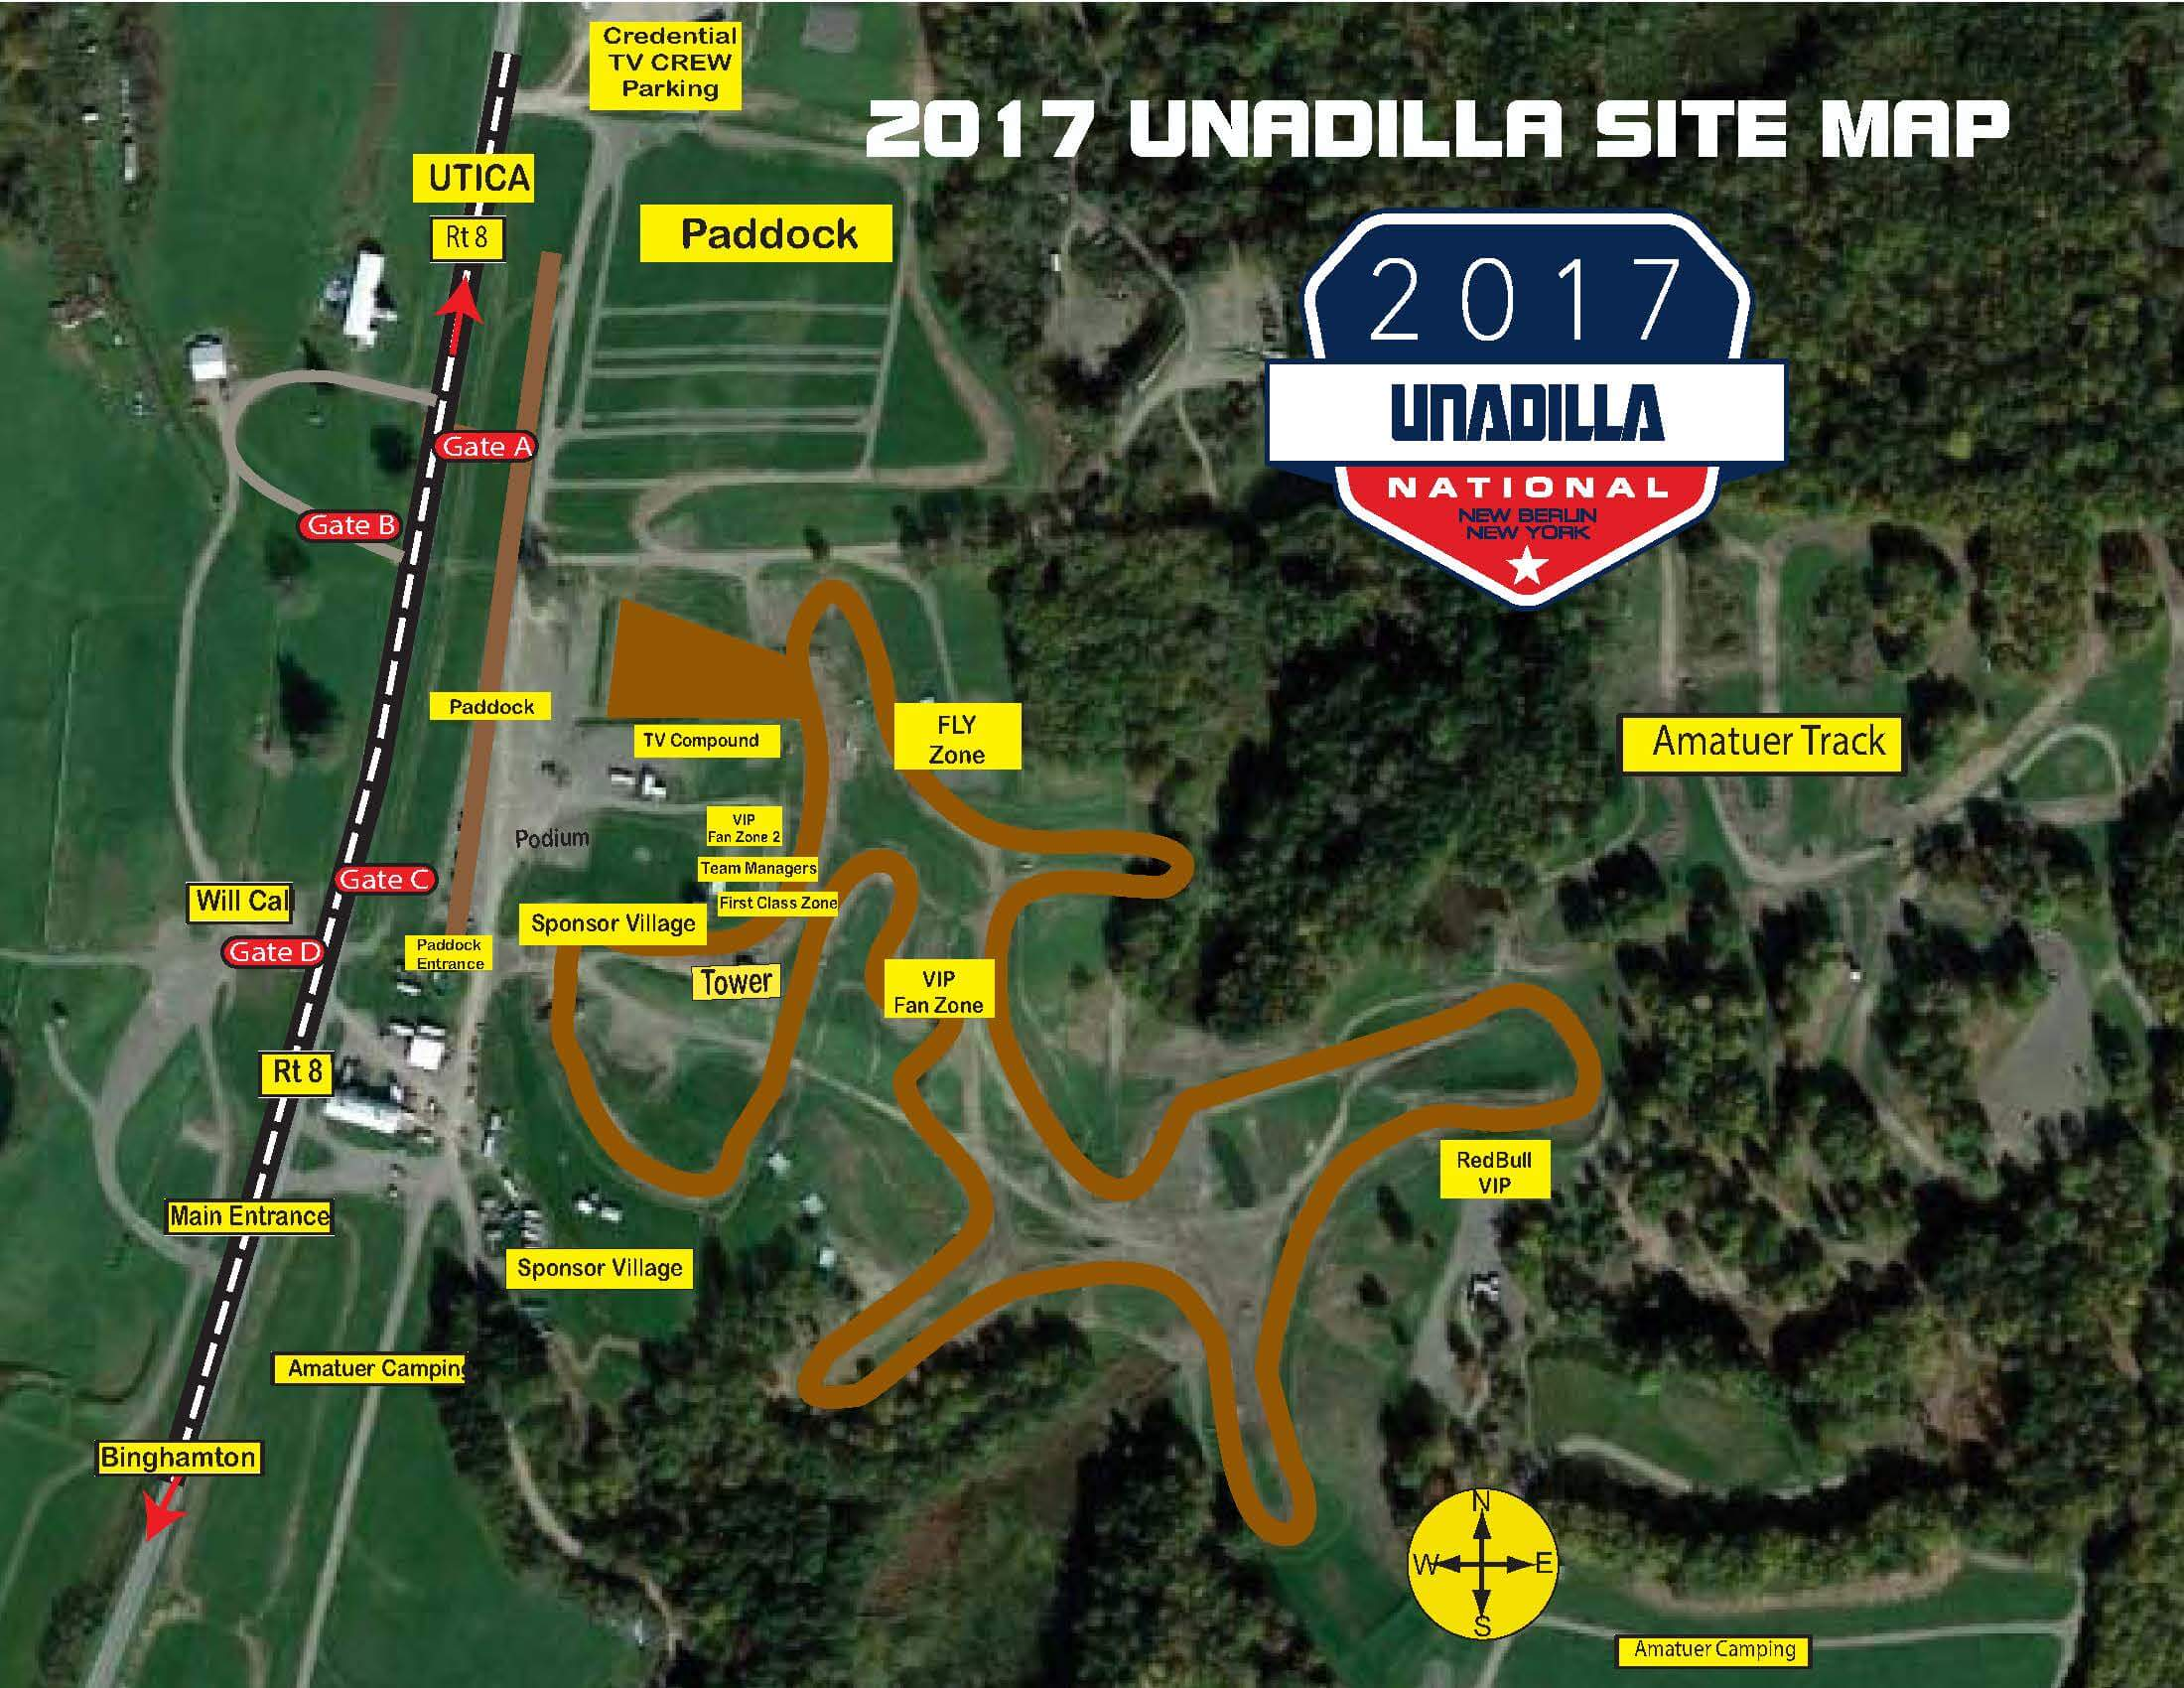 2017 Unadilla Site Map.jpg